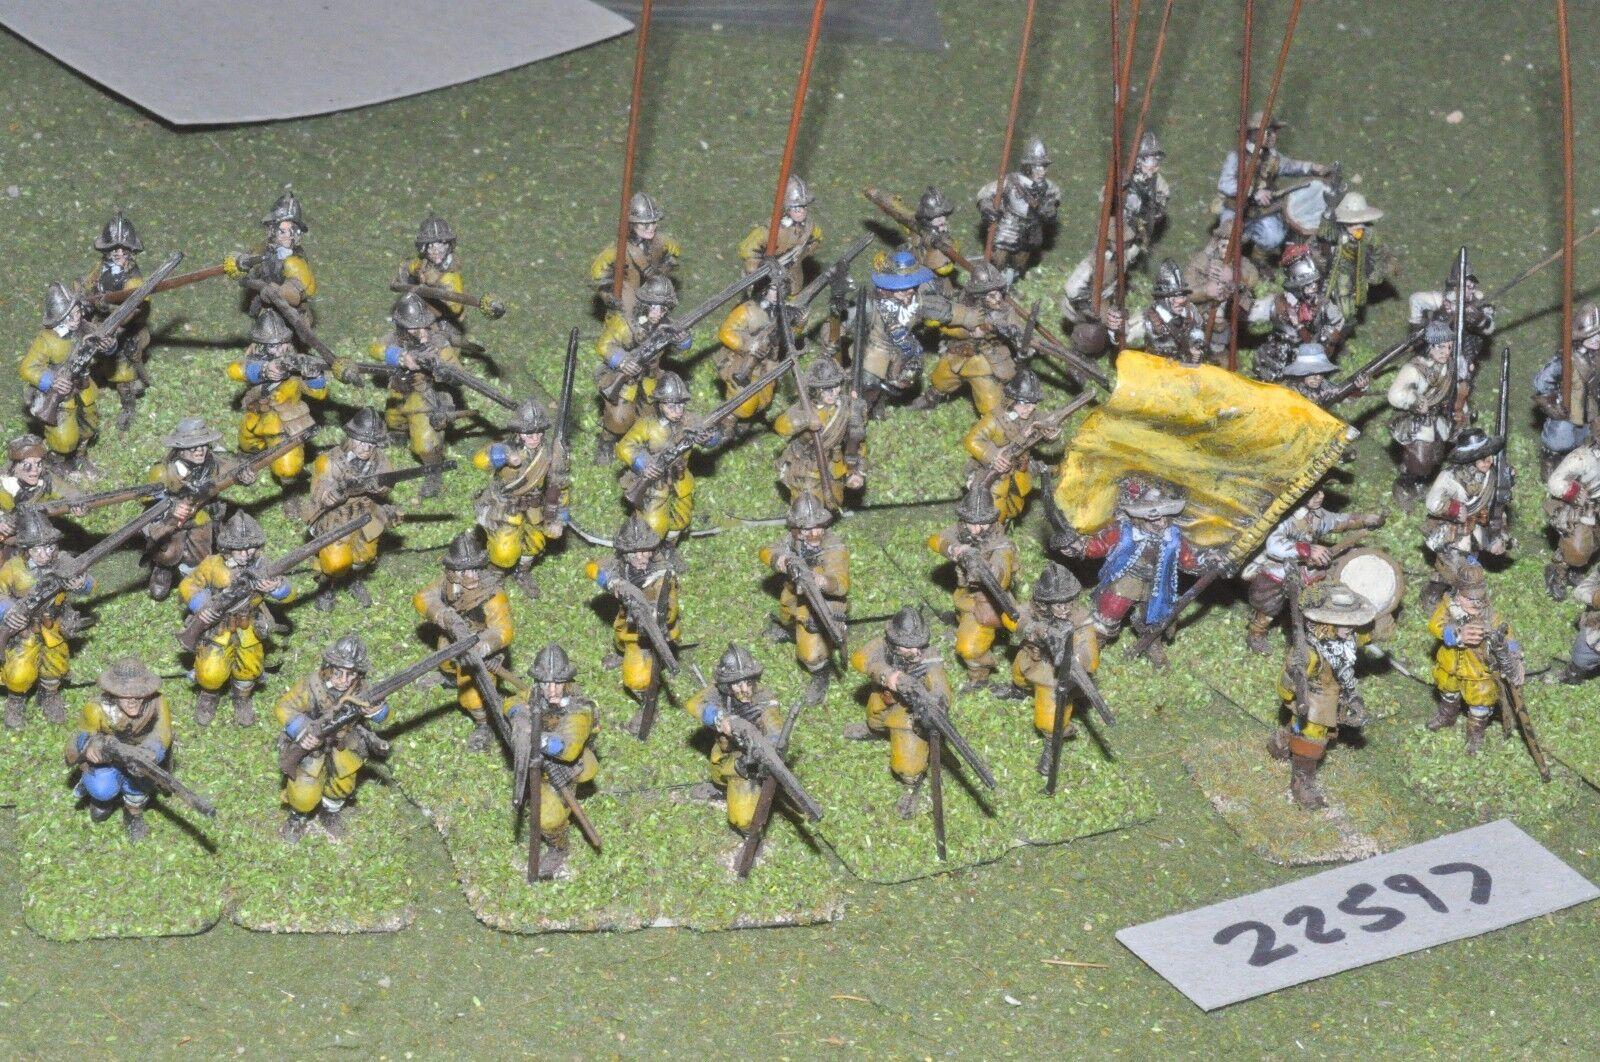 25mm Ecw inglés-Guerra Civil Pike & Shot algunos plástico 56 figuras-INF (22597)